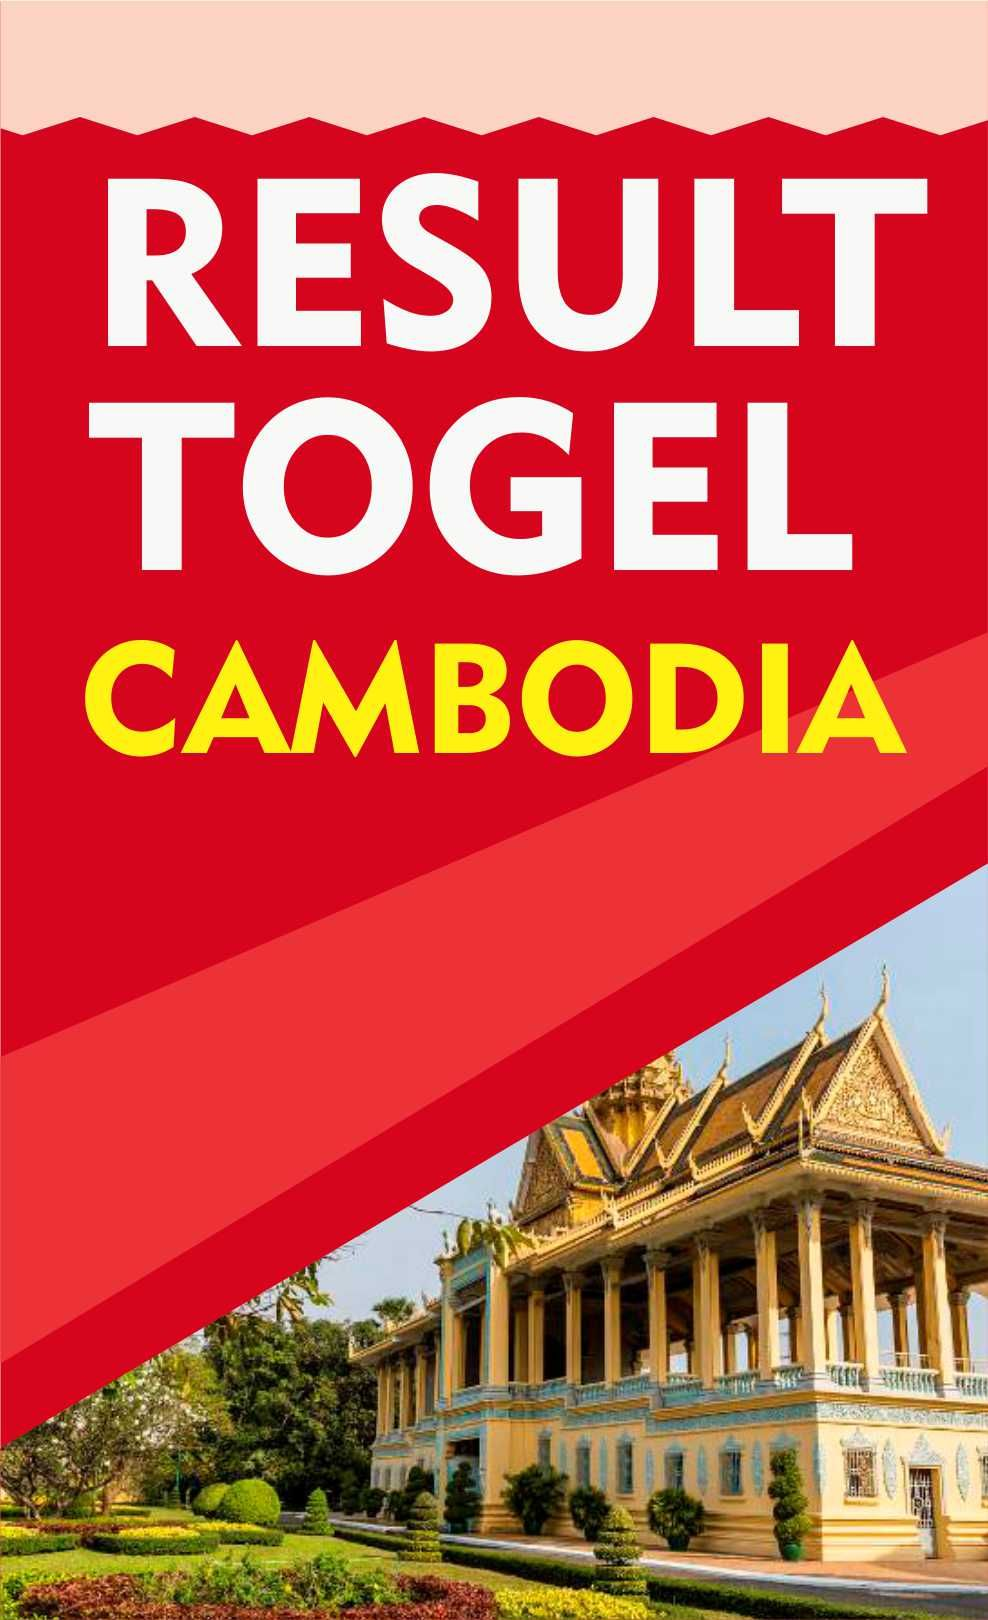 Tabel Data Angka Keluaran Togel Cambodia 2018, Silahkan diamati